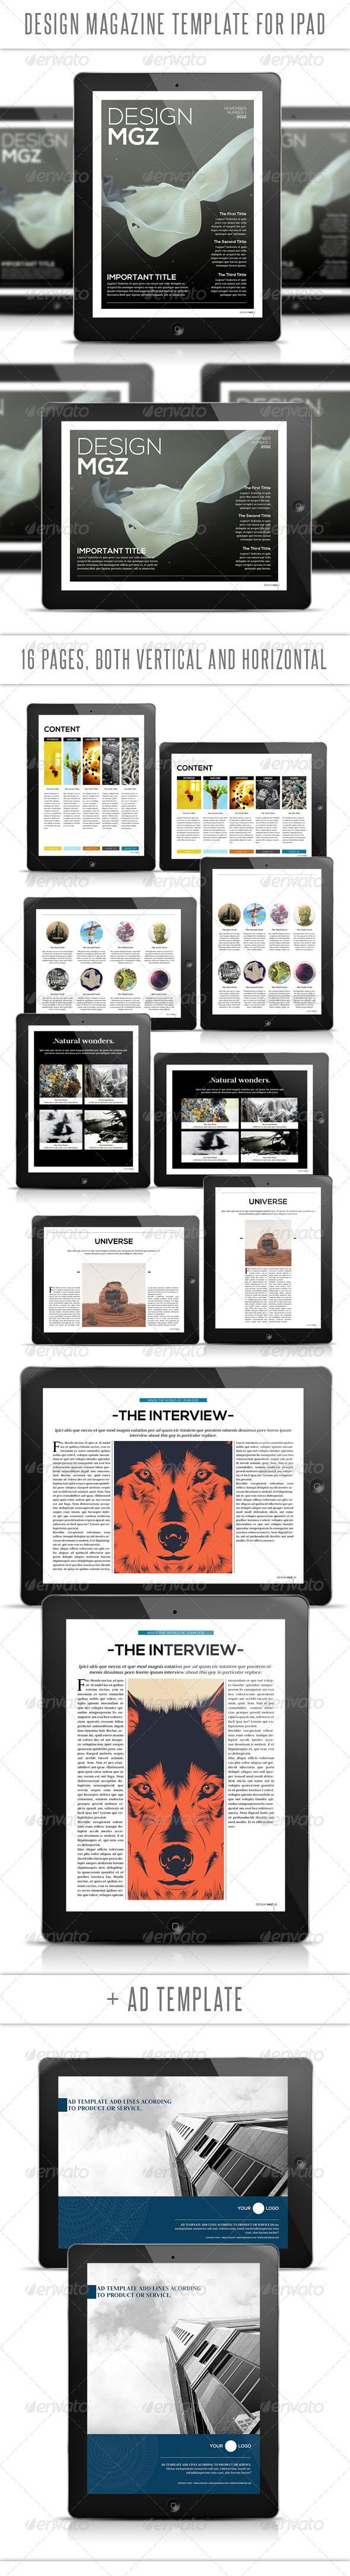 GraphicRiver Design Tablet Magazine Template 3267527